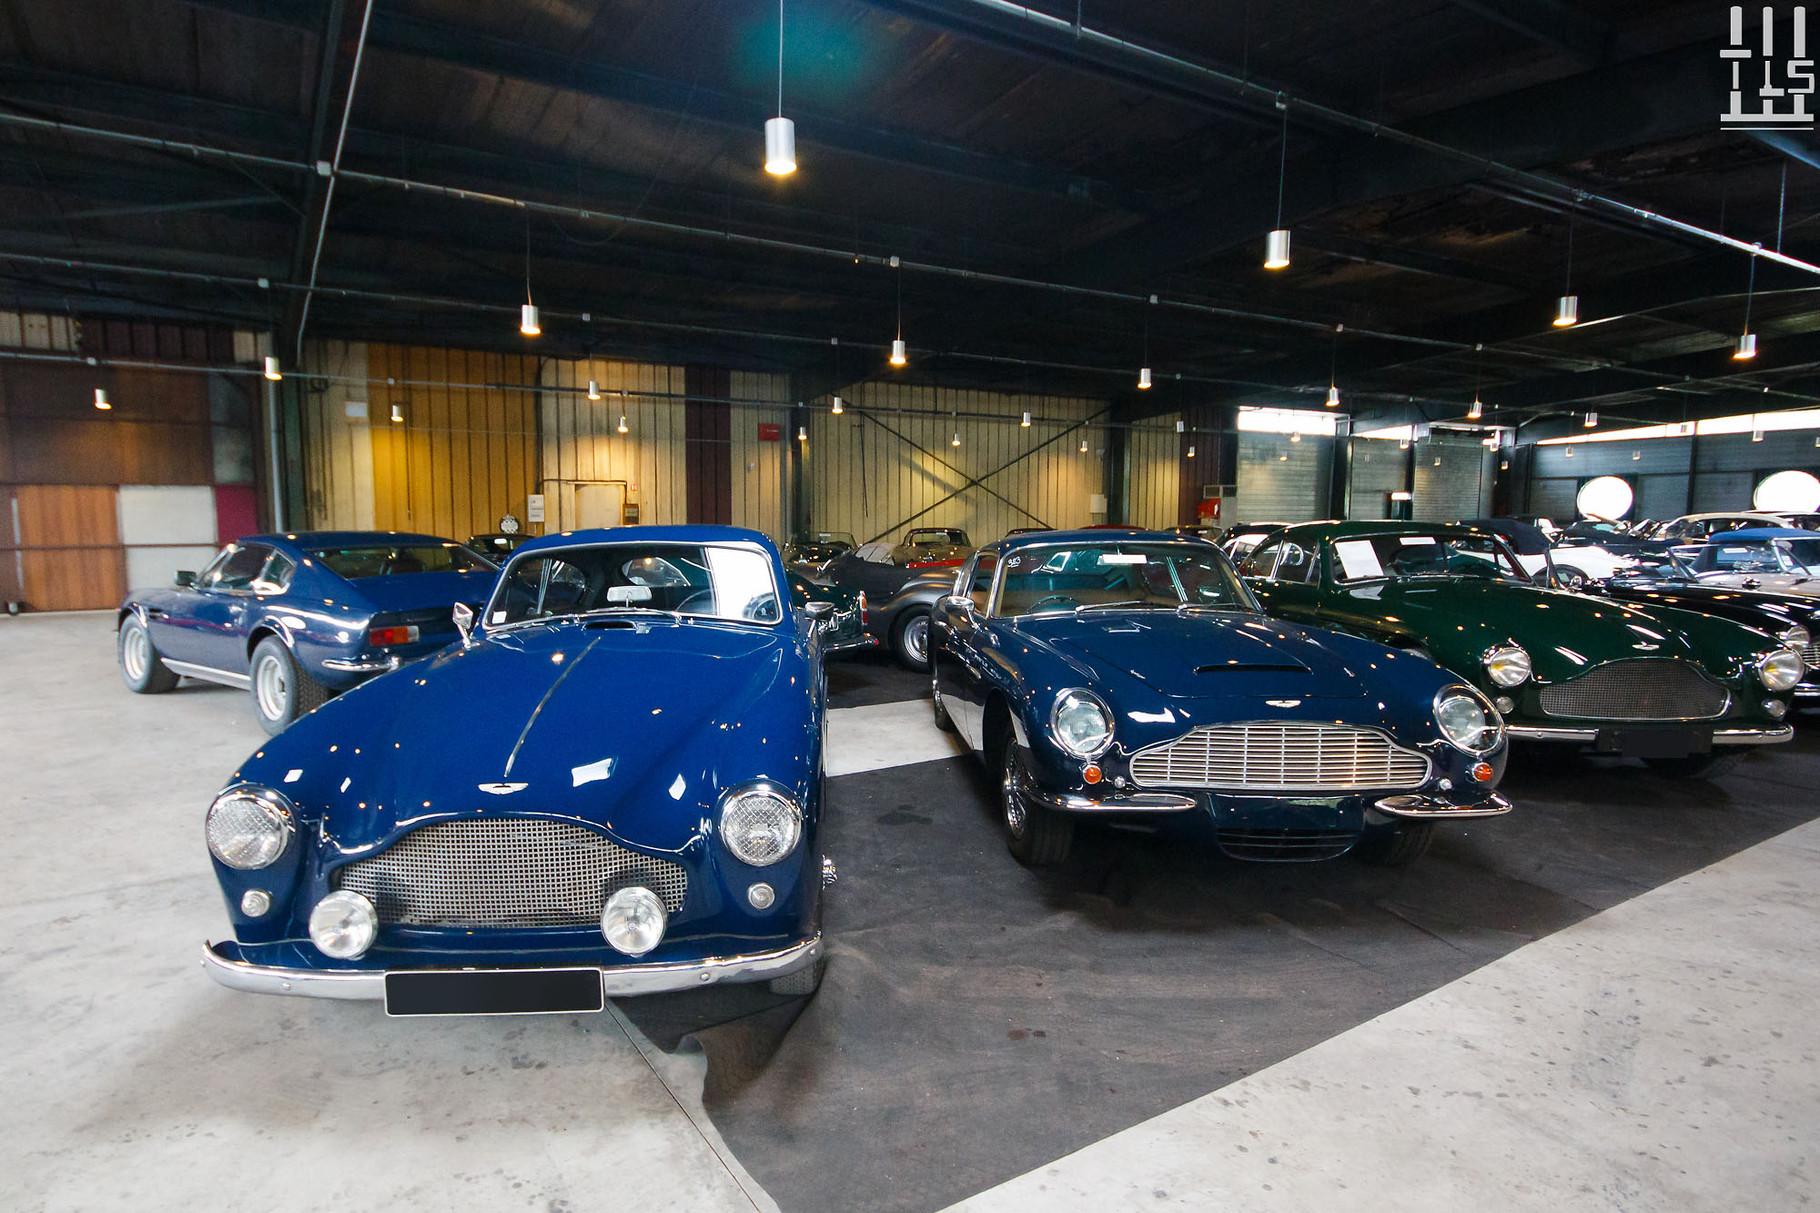 Aston Martin DB2, Aston Martin DB6, Aston Martin DB2